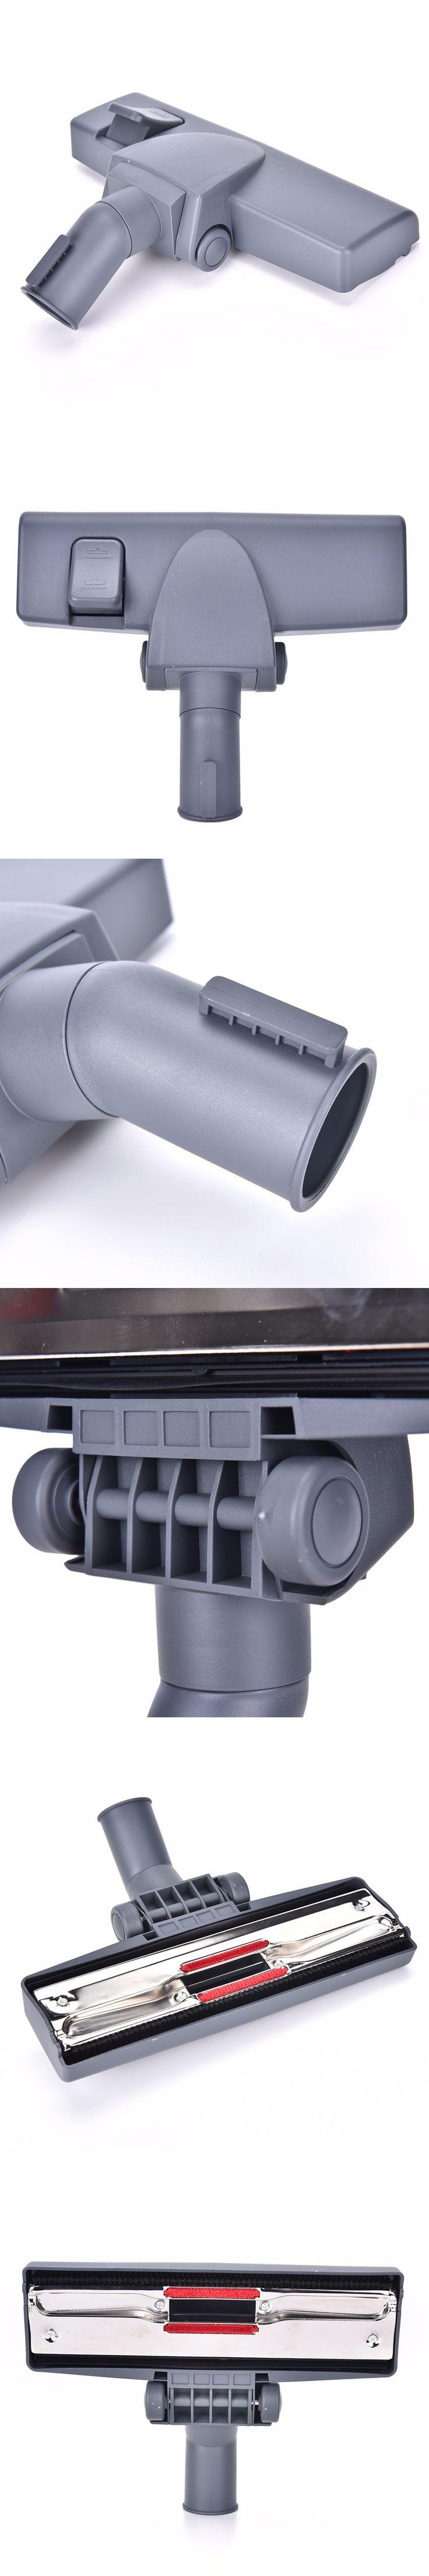 High quality Vacuum Cleaner Brush Head 35mm Floor Tool Brush Head Wheeled Vax Miele Fad